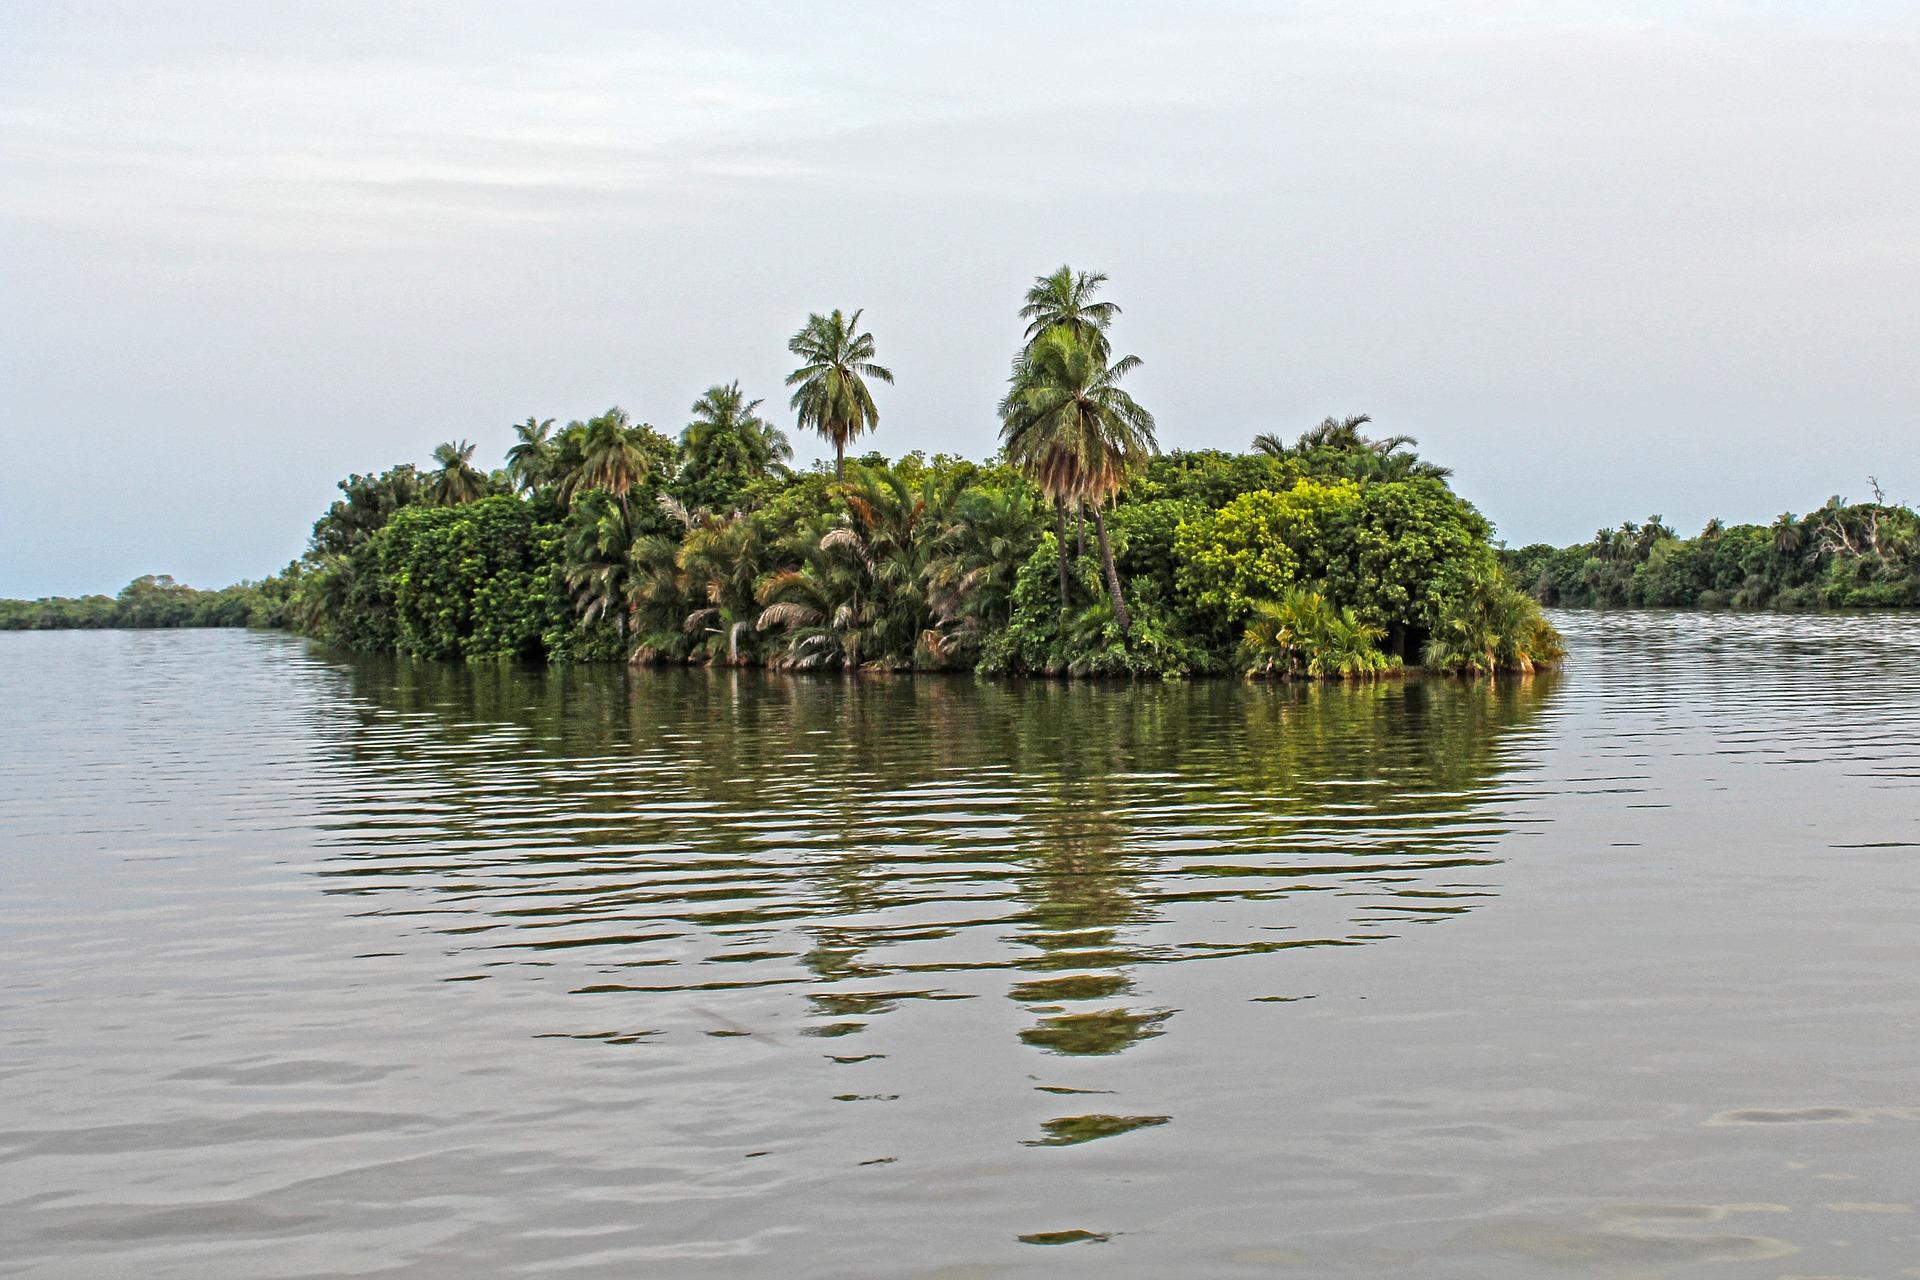 Die Landschaft um Serekunda in Gambia herum